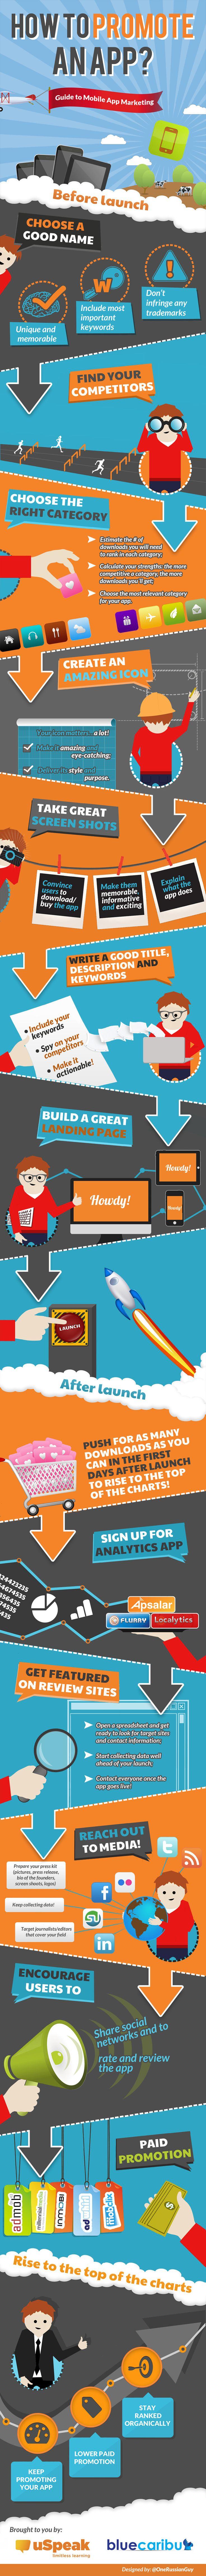 App Marketing Guide #RideTheMobileTsunami